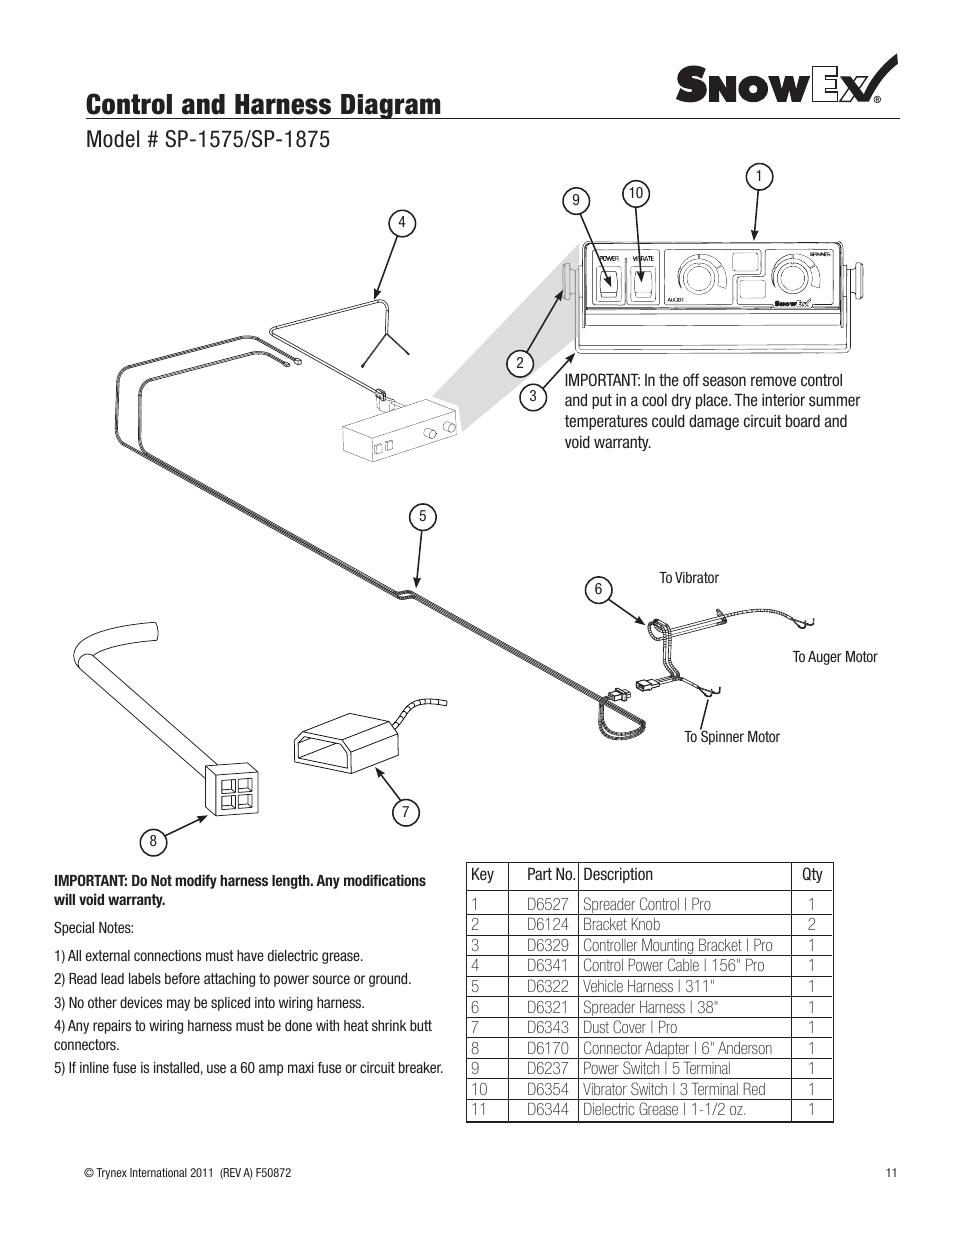 hight resolution of snowex wiring diagram wiring diagram centre snowex wiring diagram control and harness diagram snowex sp 1875